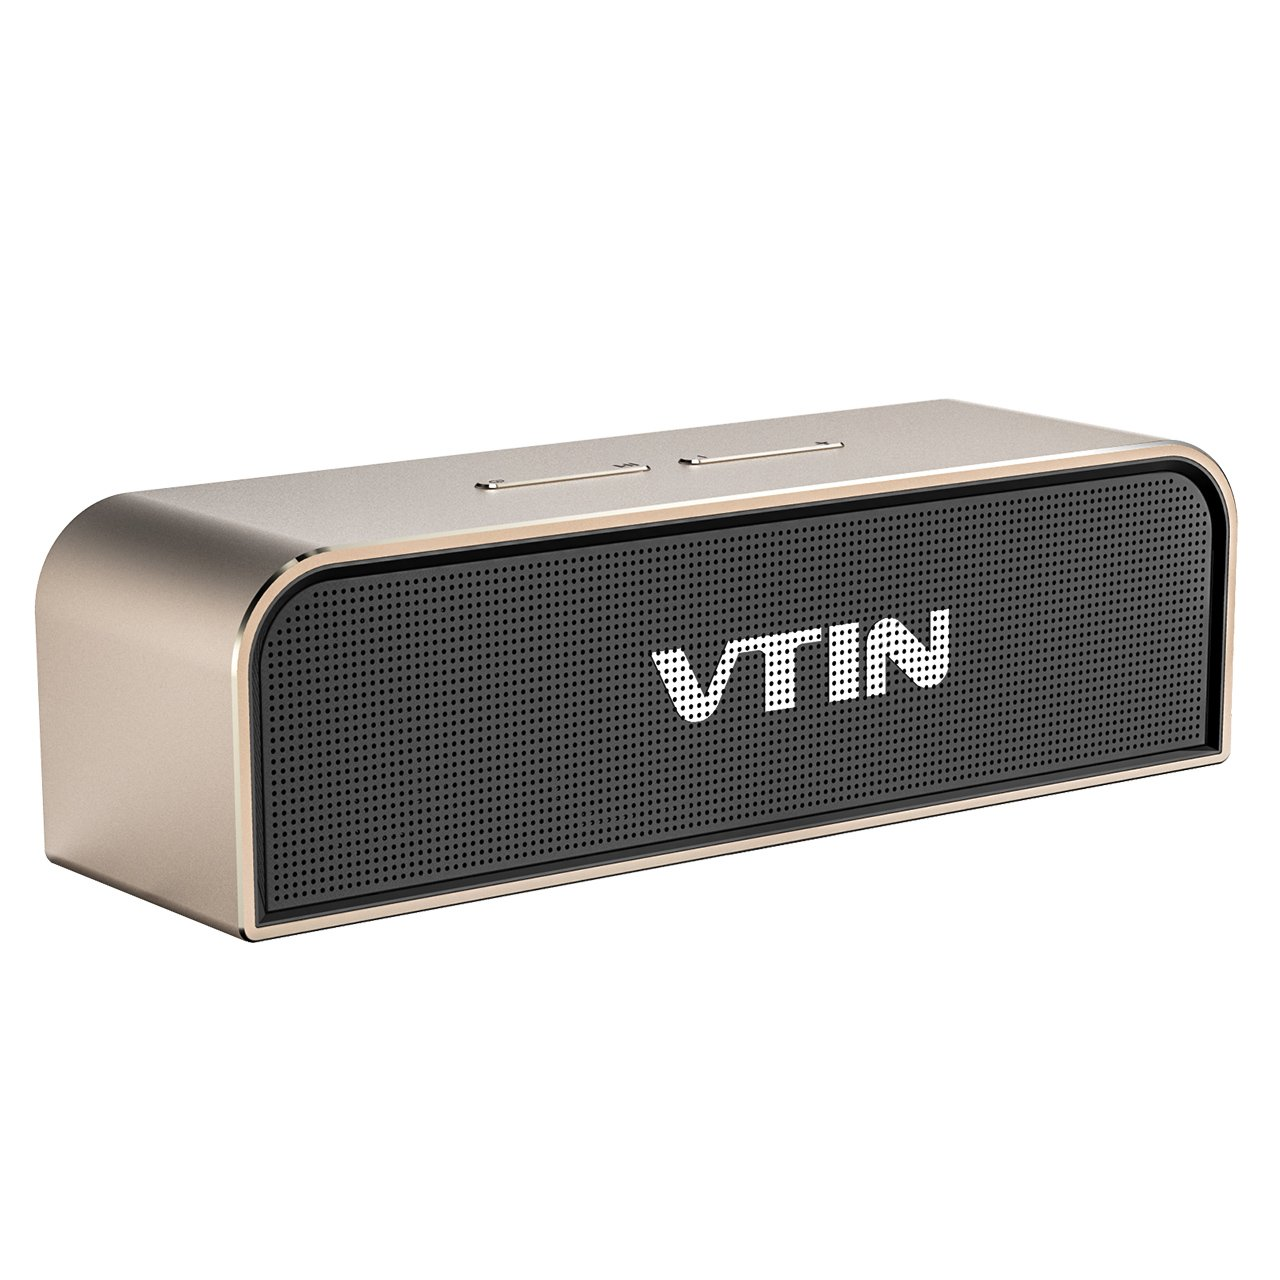 Vtin Royaler Altavoz Bluetooth, 20W Salida de Dual 10W Drivers con Radiador Pasivo, Subwoofer, Graves Profundos Para HUAWEI, XIAOMI, IPHONE,...